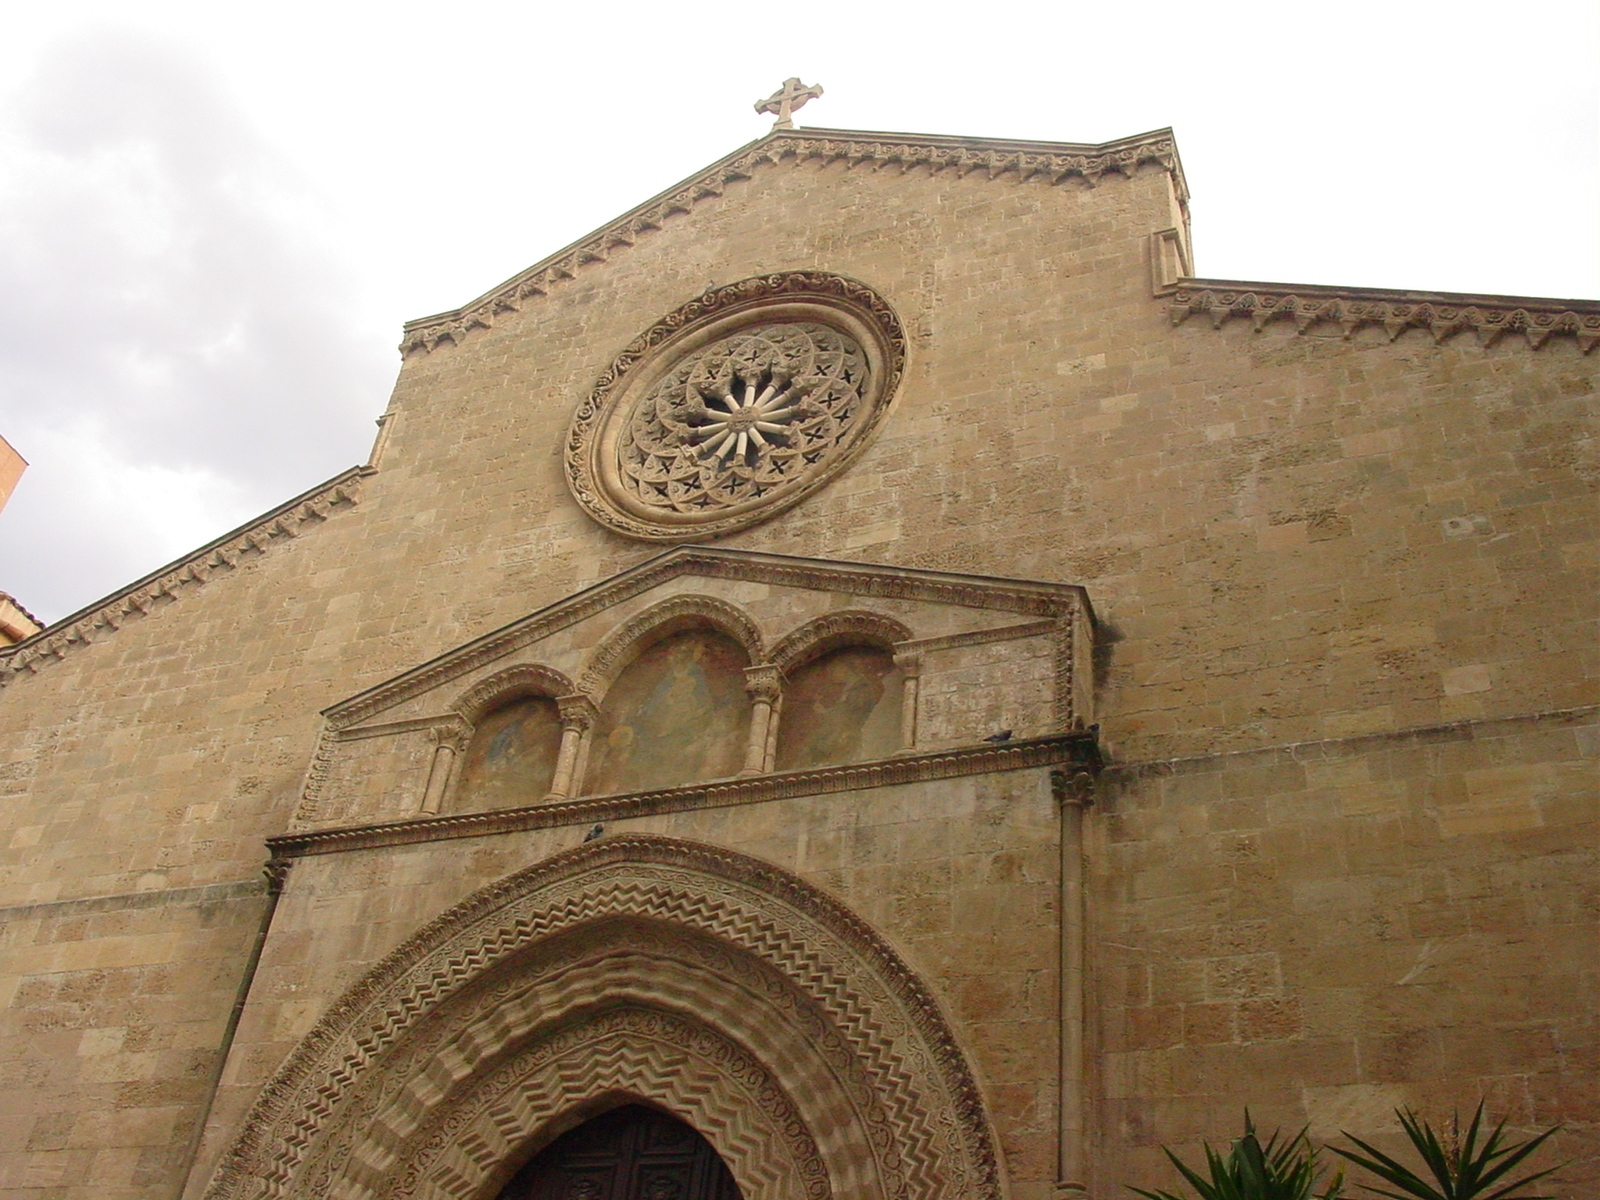 San-Francesco-dAssisi